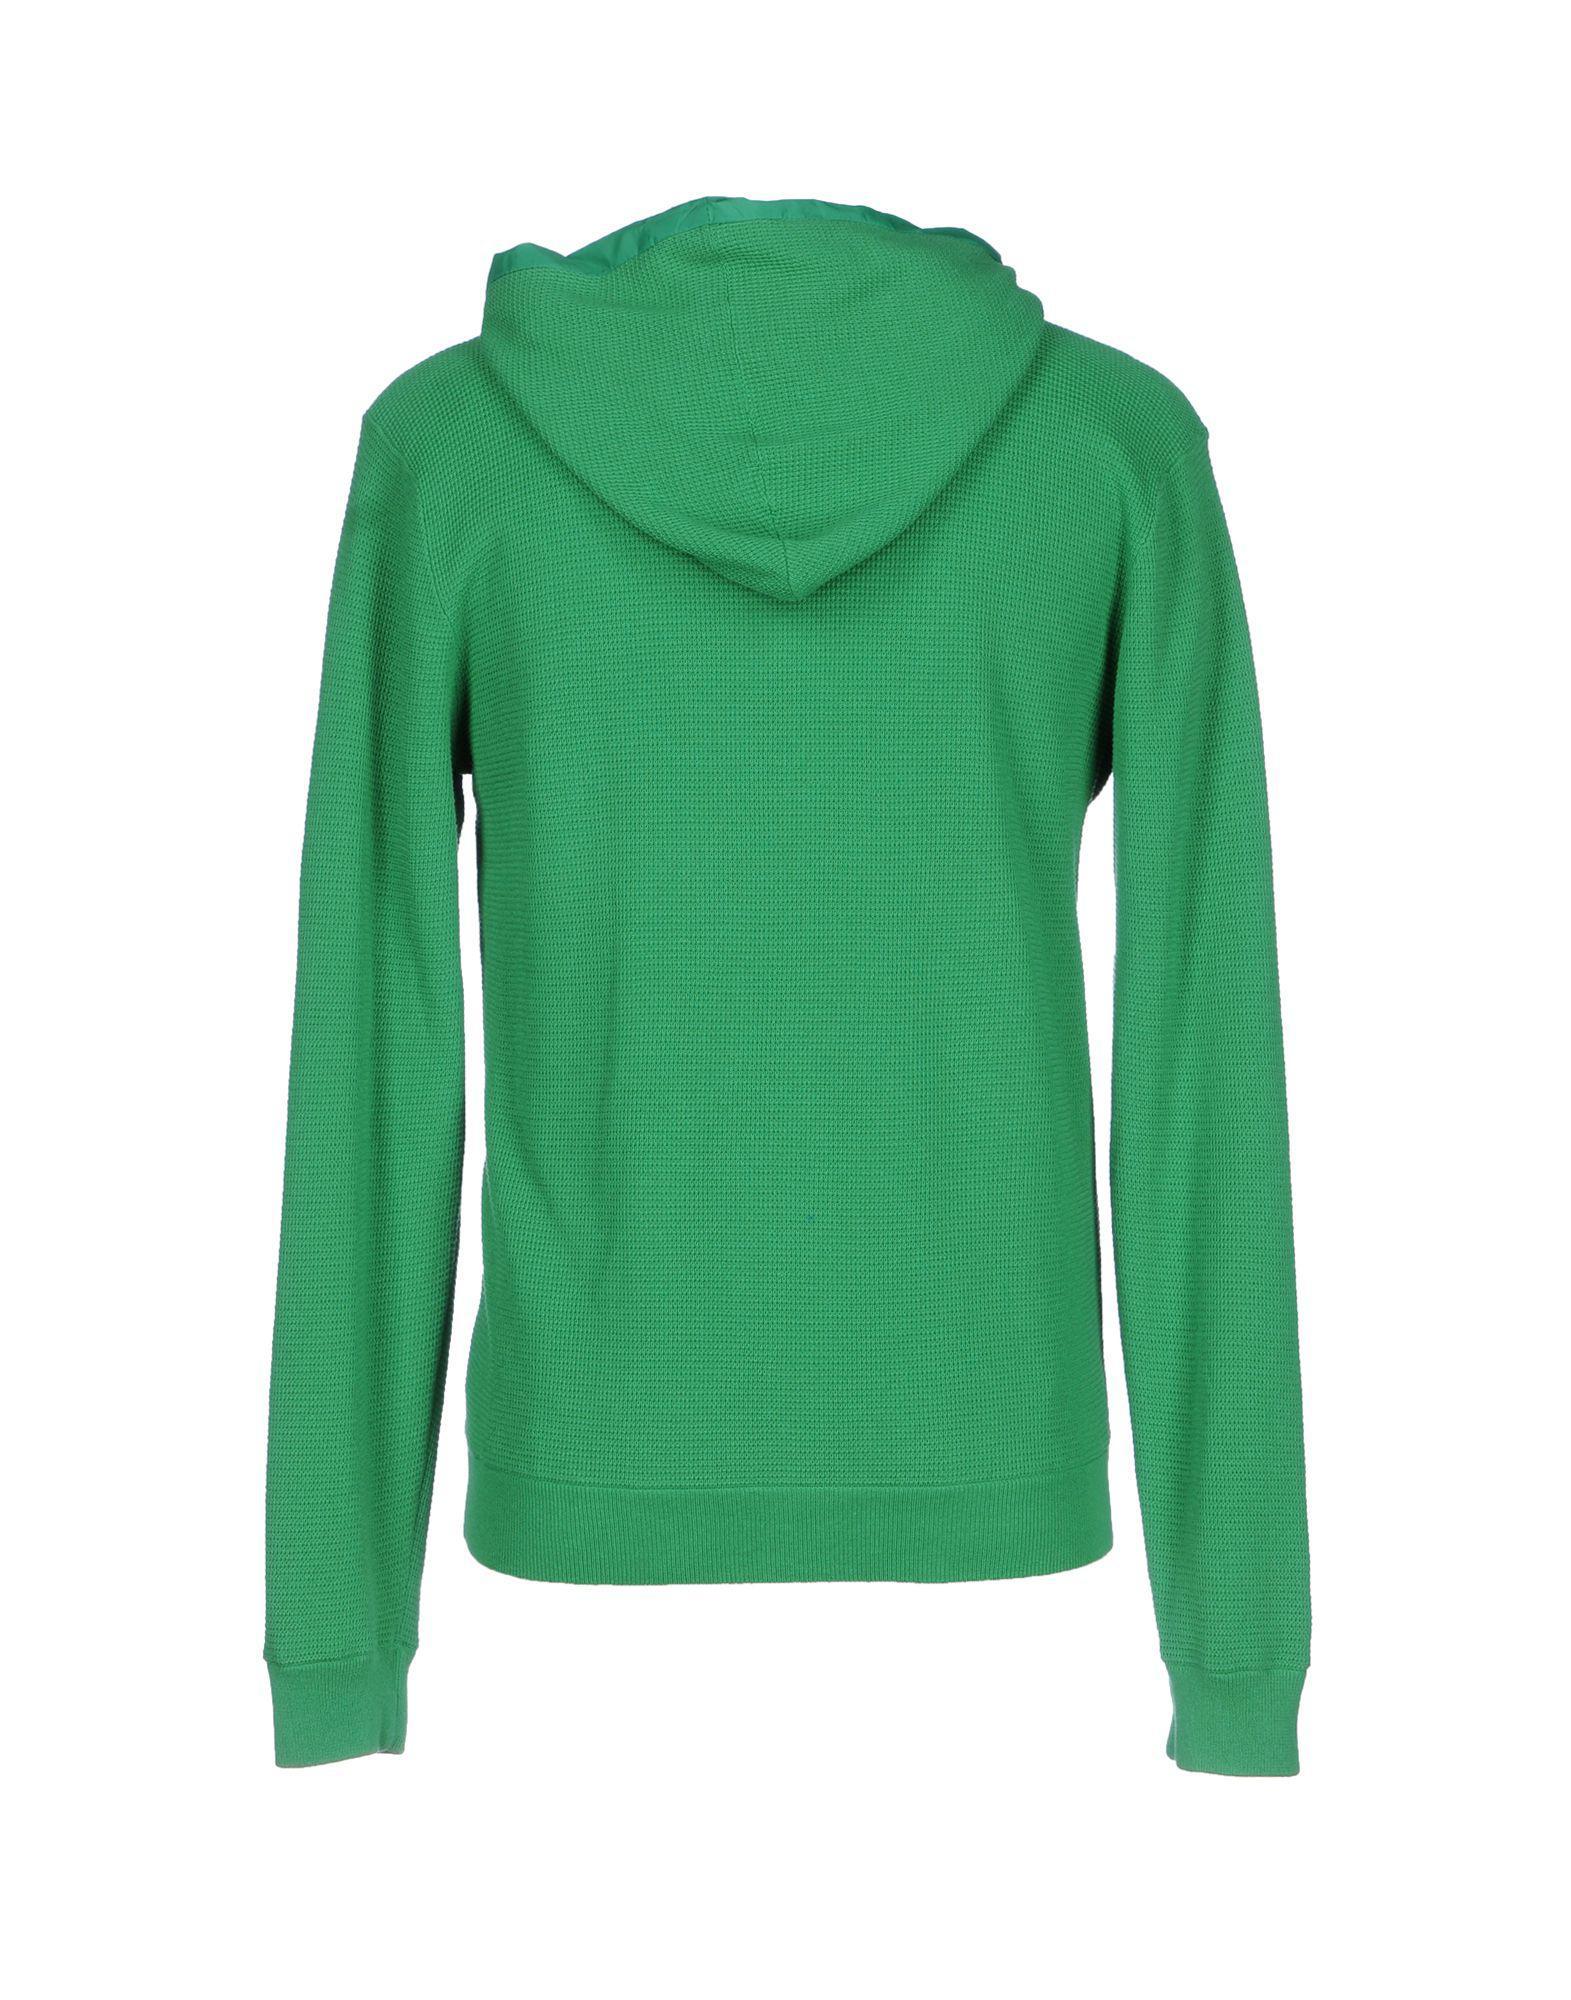 Bark Cotton Jacket in Green for Men